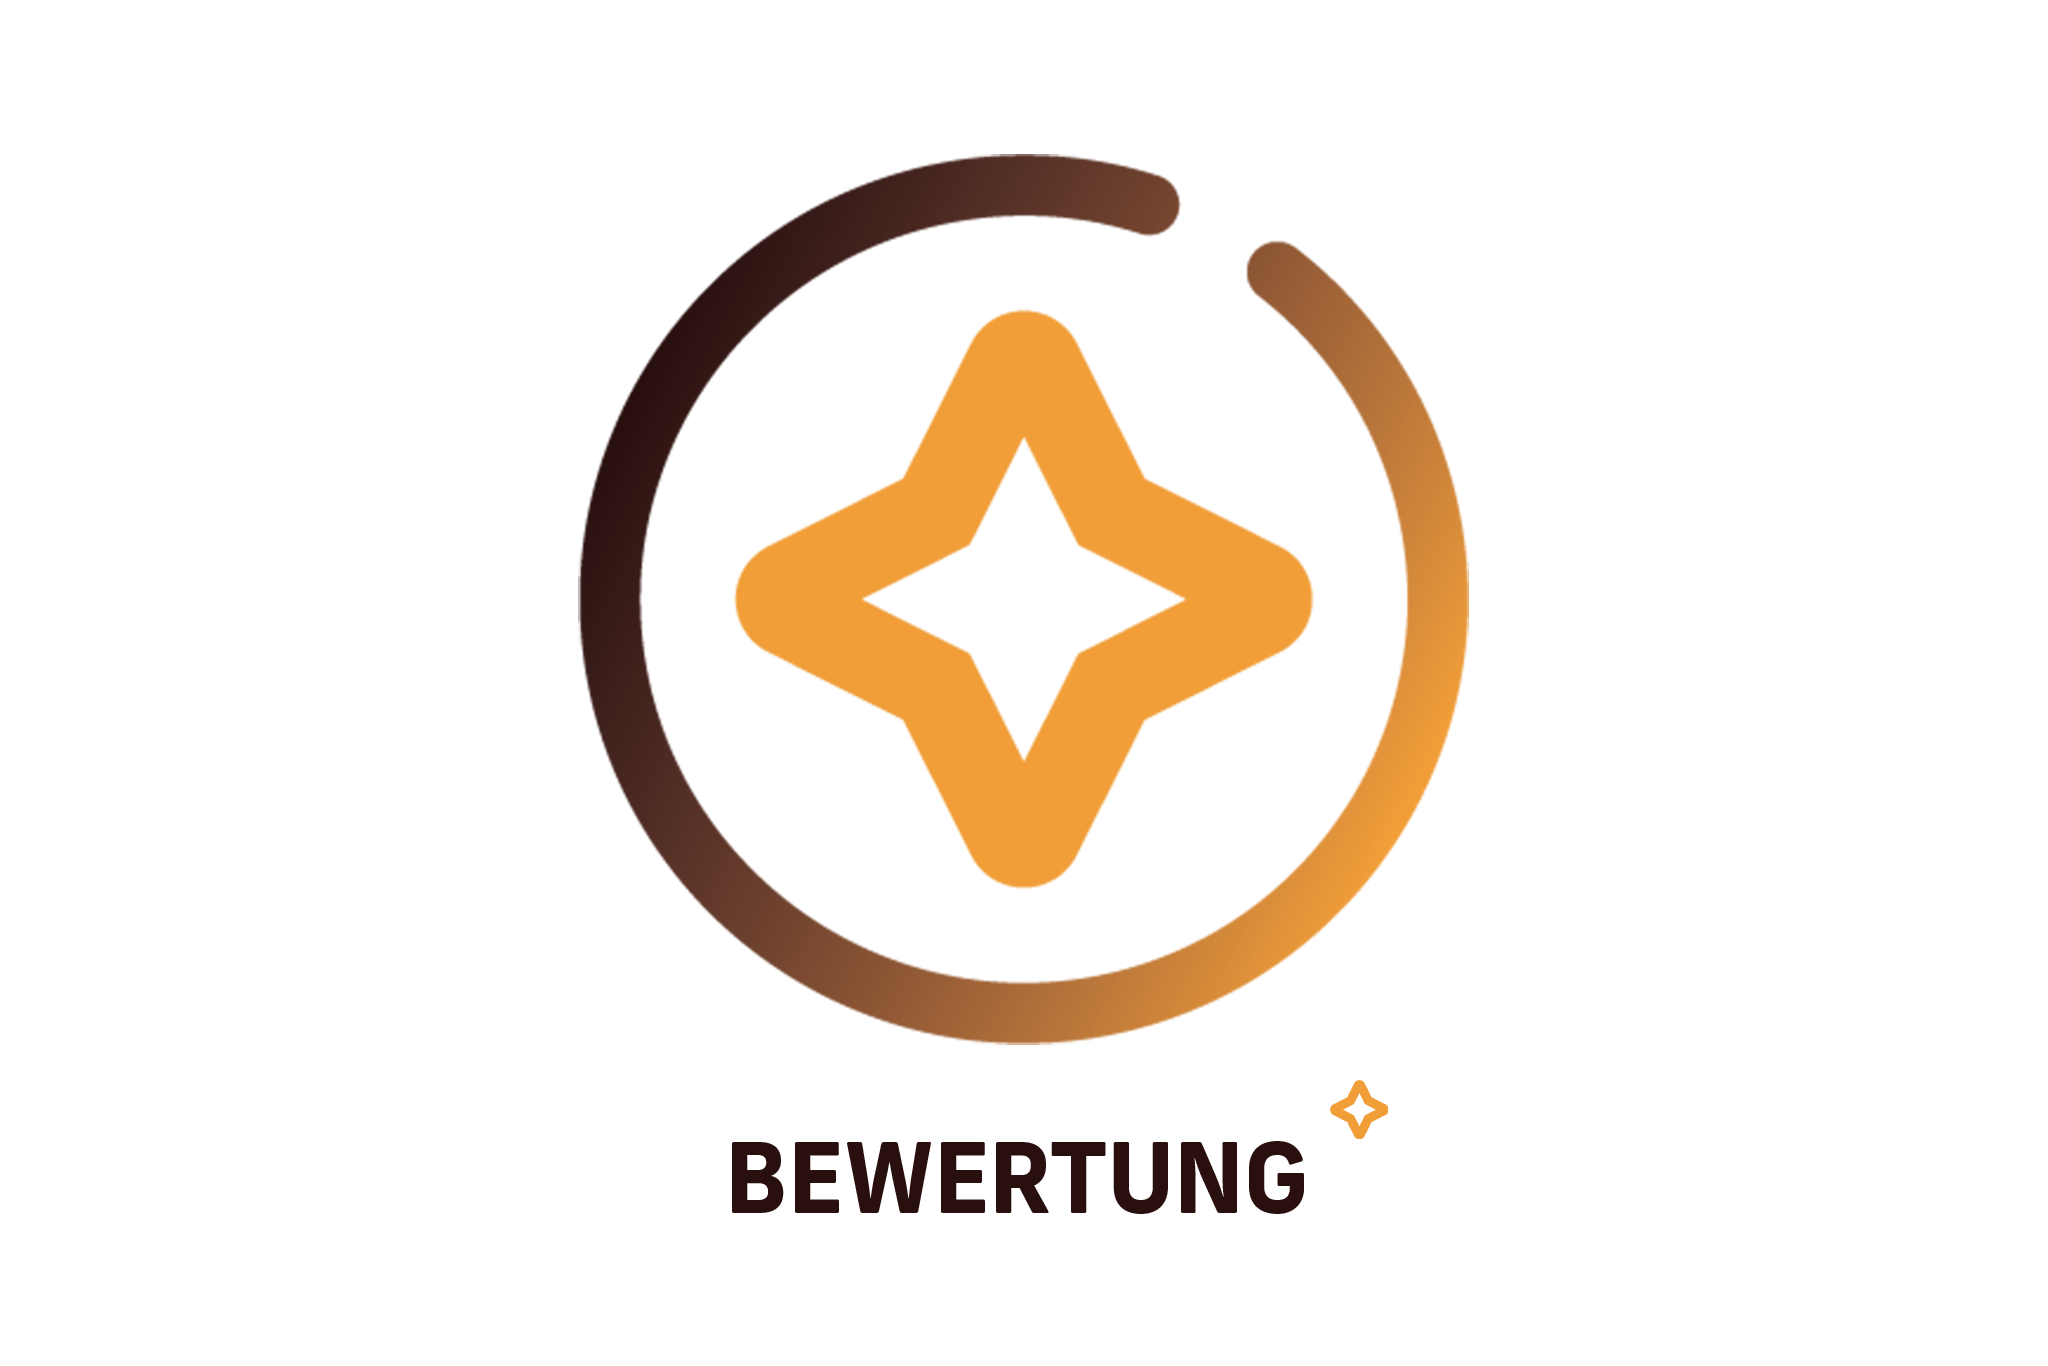 https://immotooler.com/wp-content/uploads/2021/04/portfolio_bewergung.png